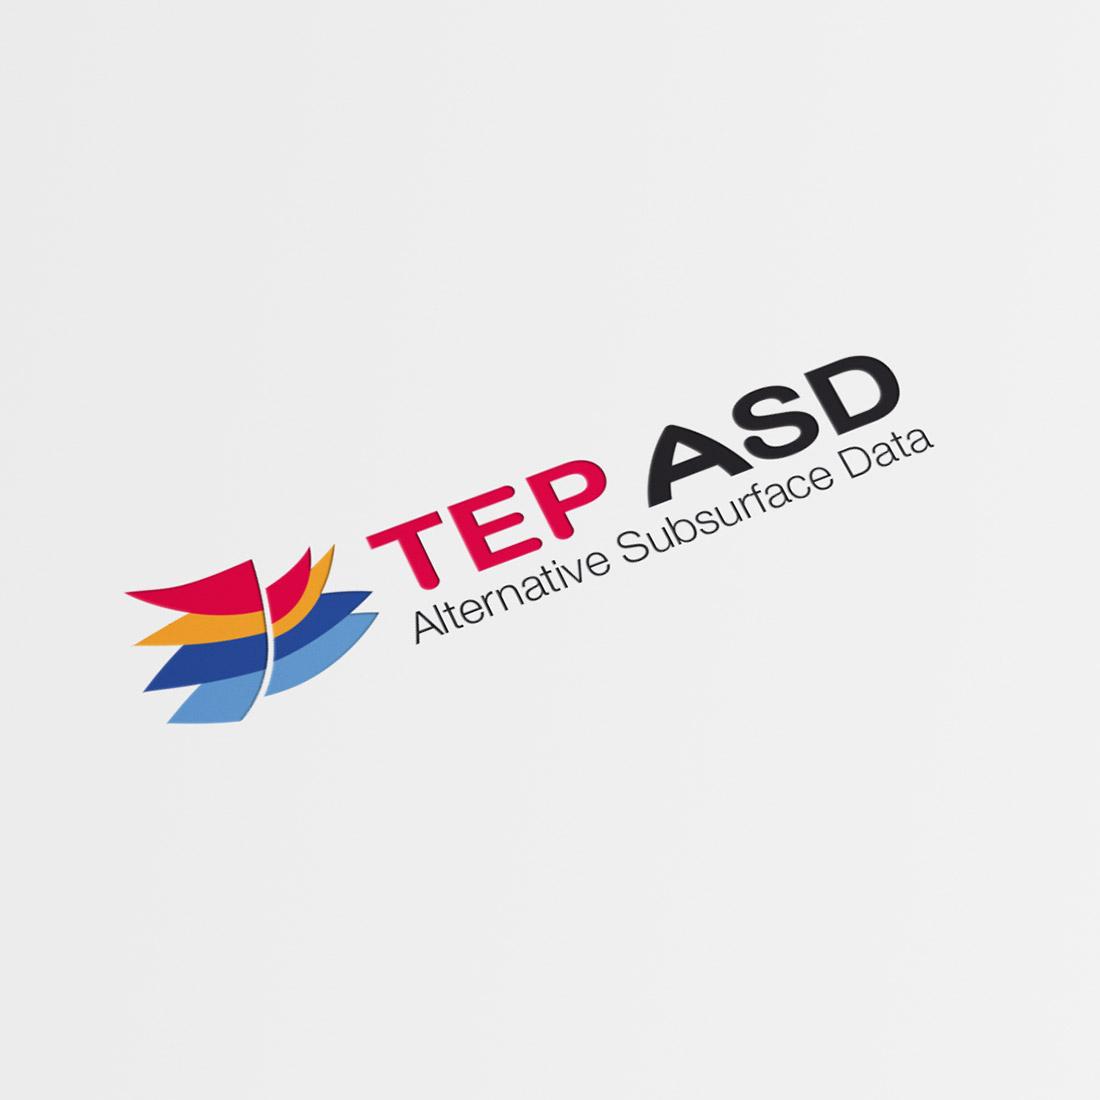 Création identité visuelle logo TEP ASD